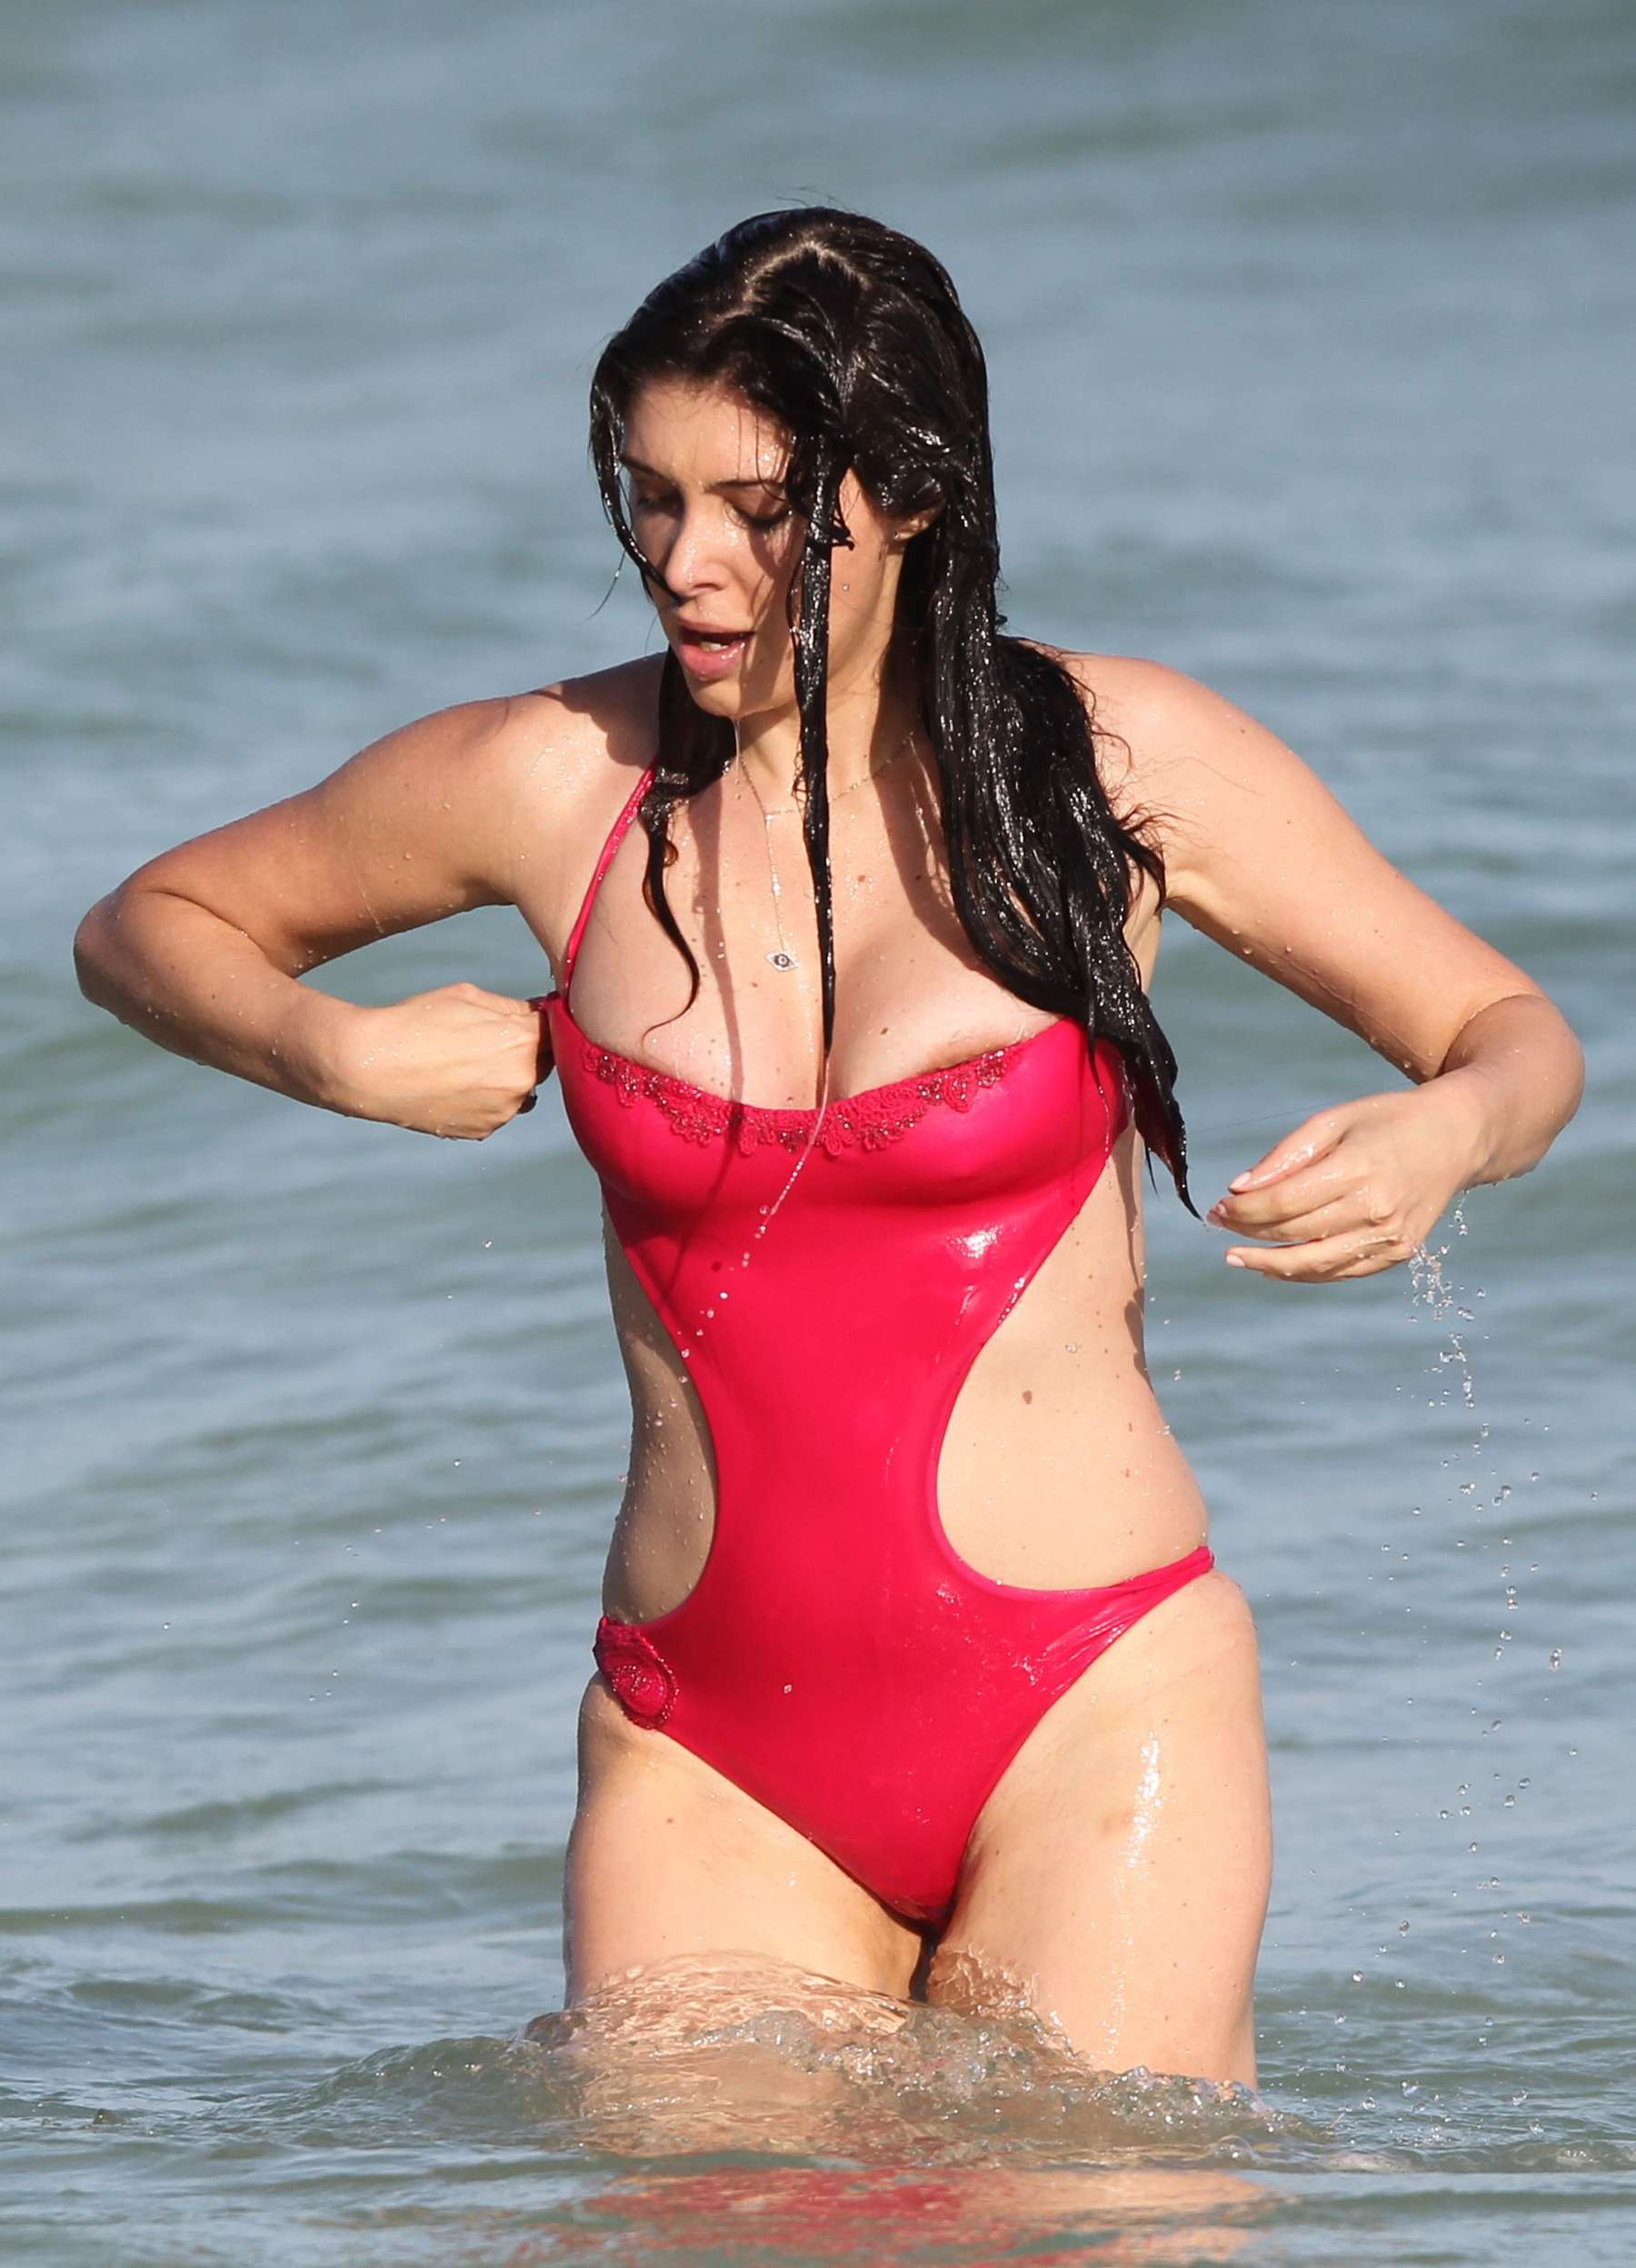 Bikini Brittny Gastineau naked (68 foto and video), Ass, Paparazzi, Feet, in bikini 2020